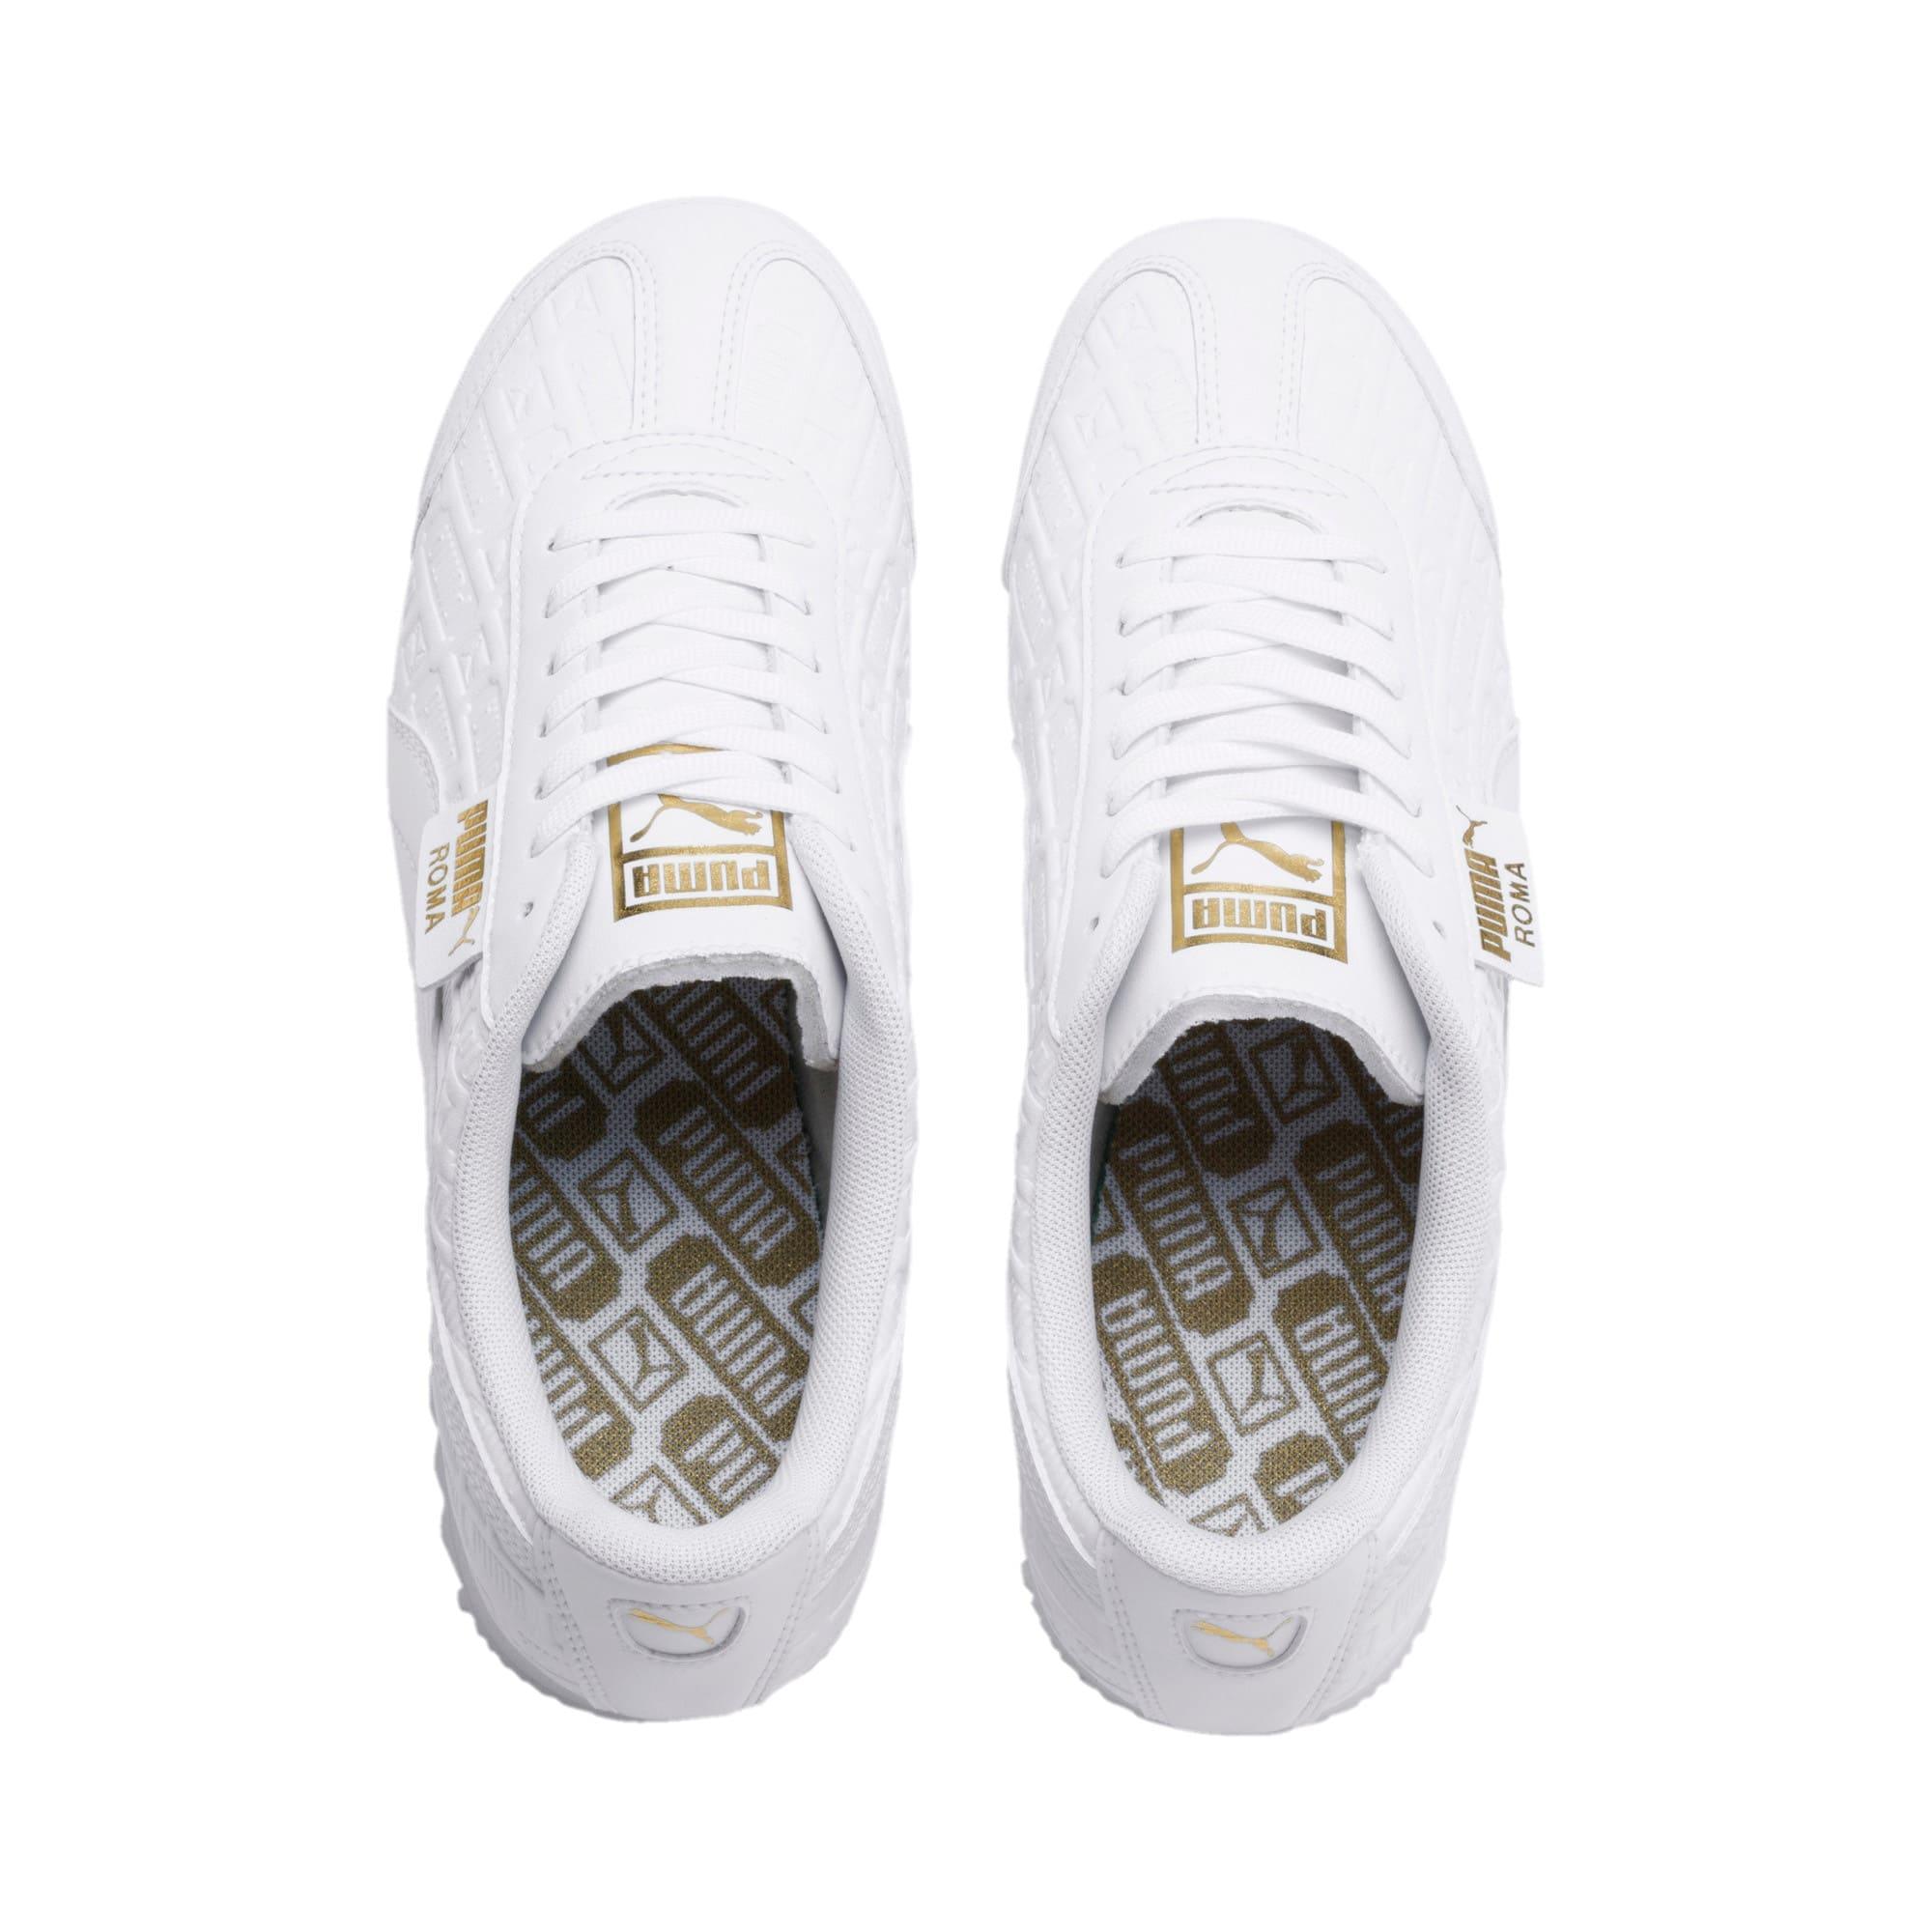 Thumbnail 7 of Roma Reinvent Women's Sneakers, Puma White-Puma Team Gold, medium